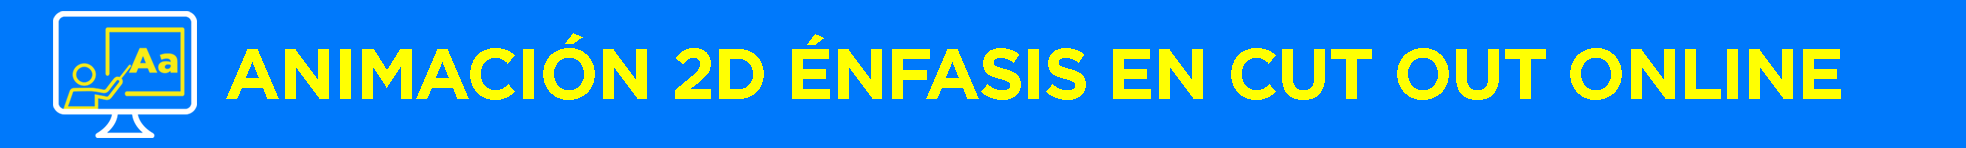 Banner título Animación con énfasis en Cut Out Online